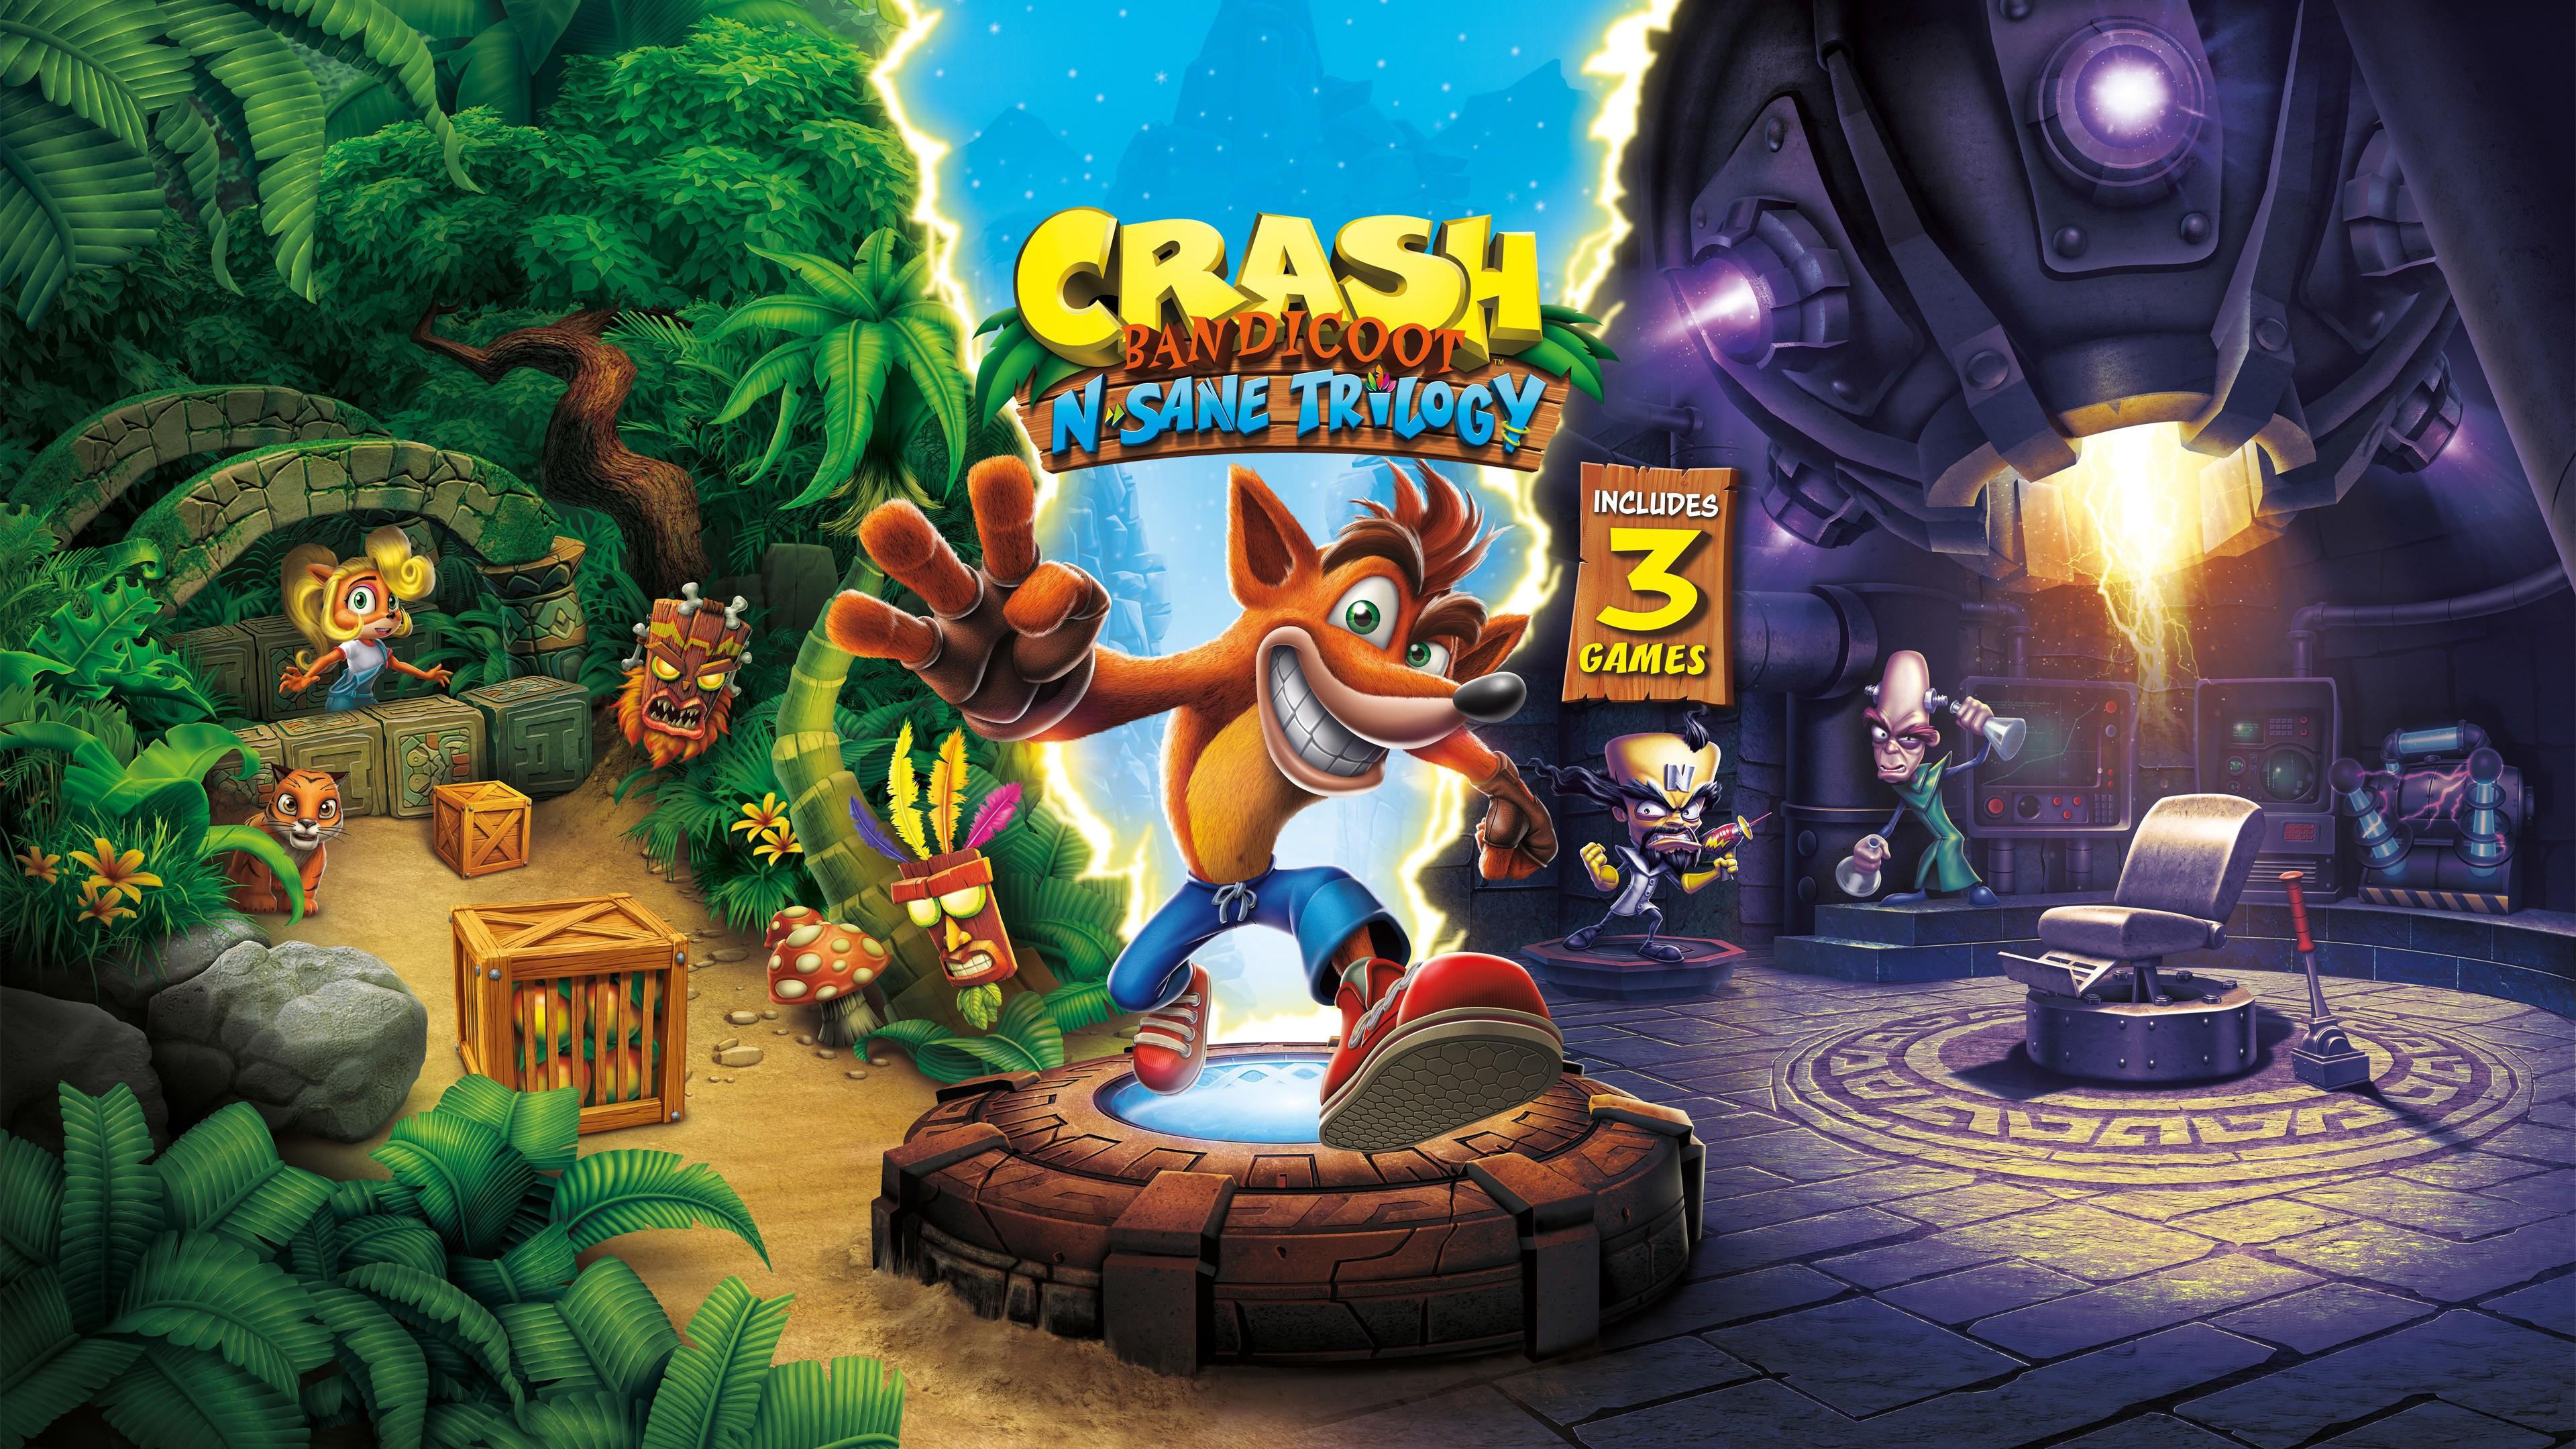 Crash Bandicoot wallpaper ·① Download free High Resolution ...